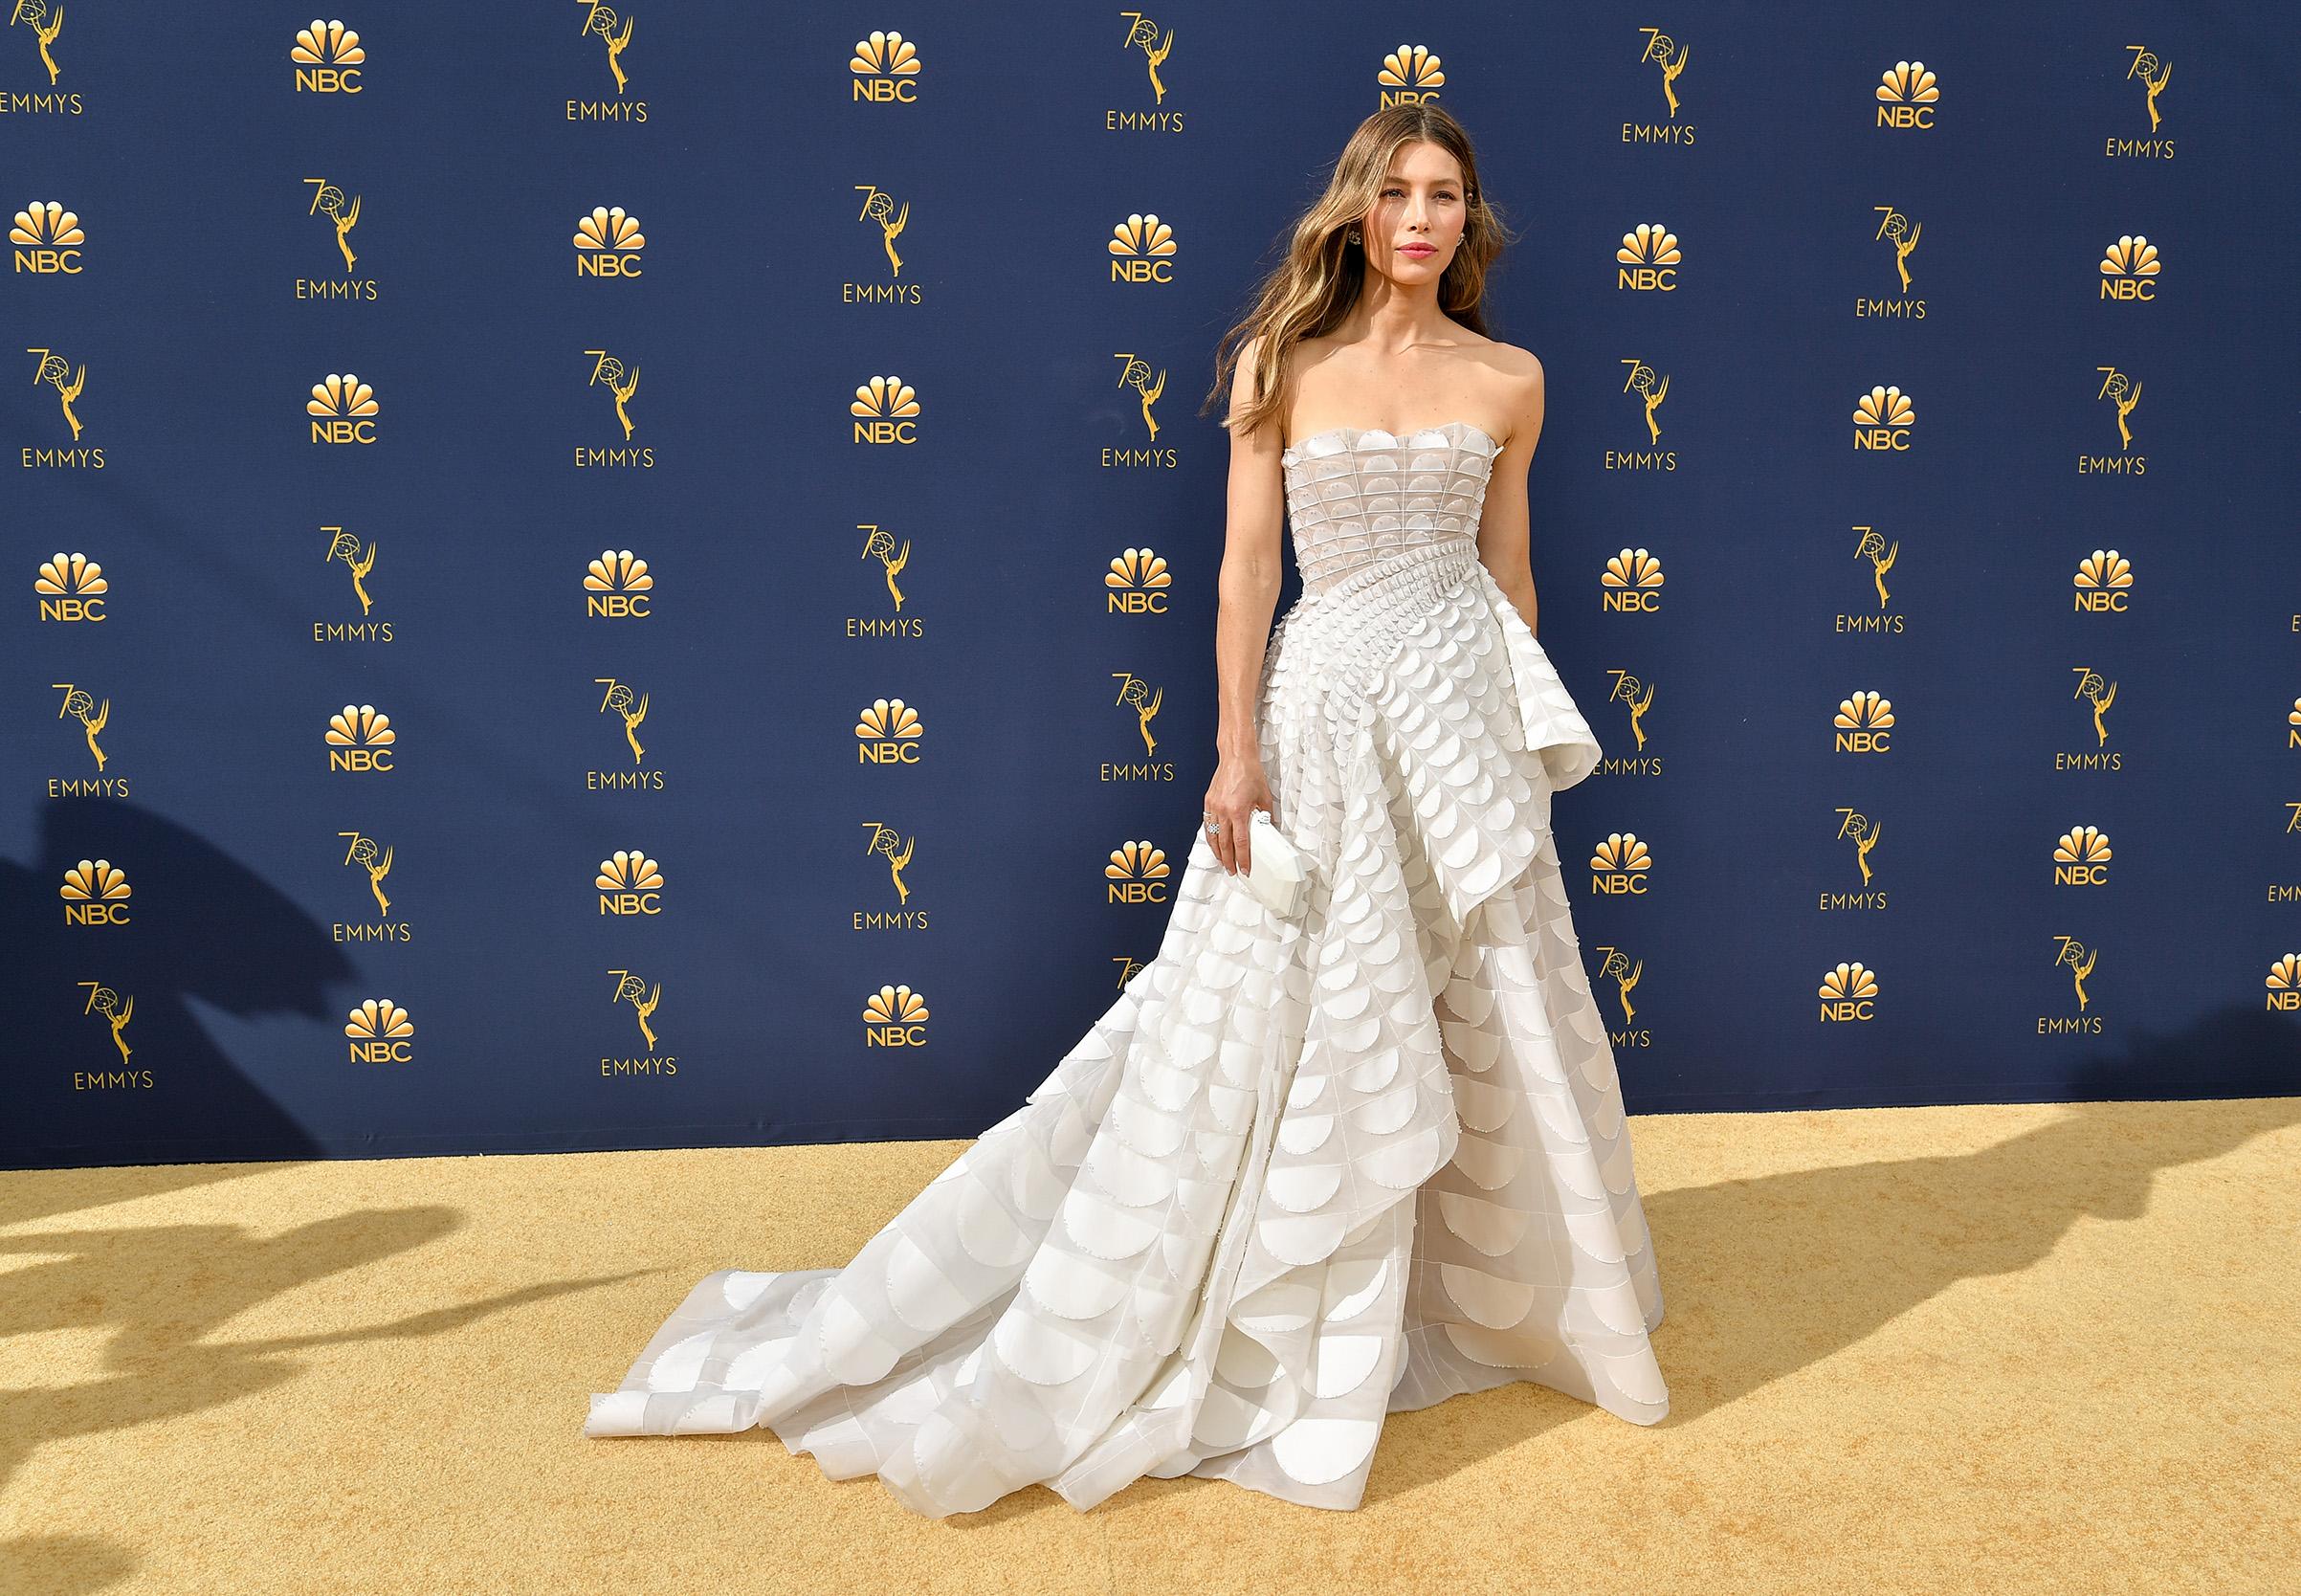 Jessica Biel at the 70th Primetime Emmy Awards on Sept. 17.